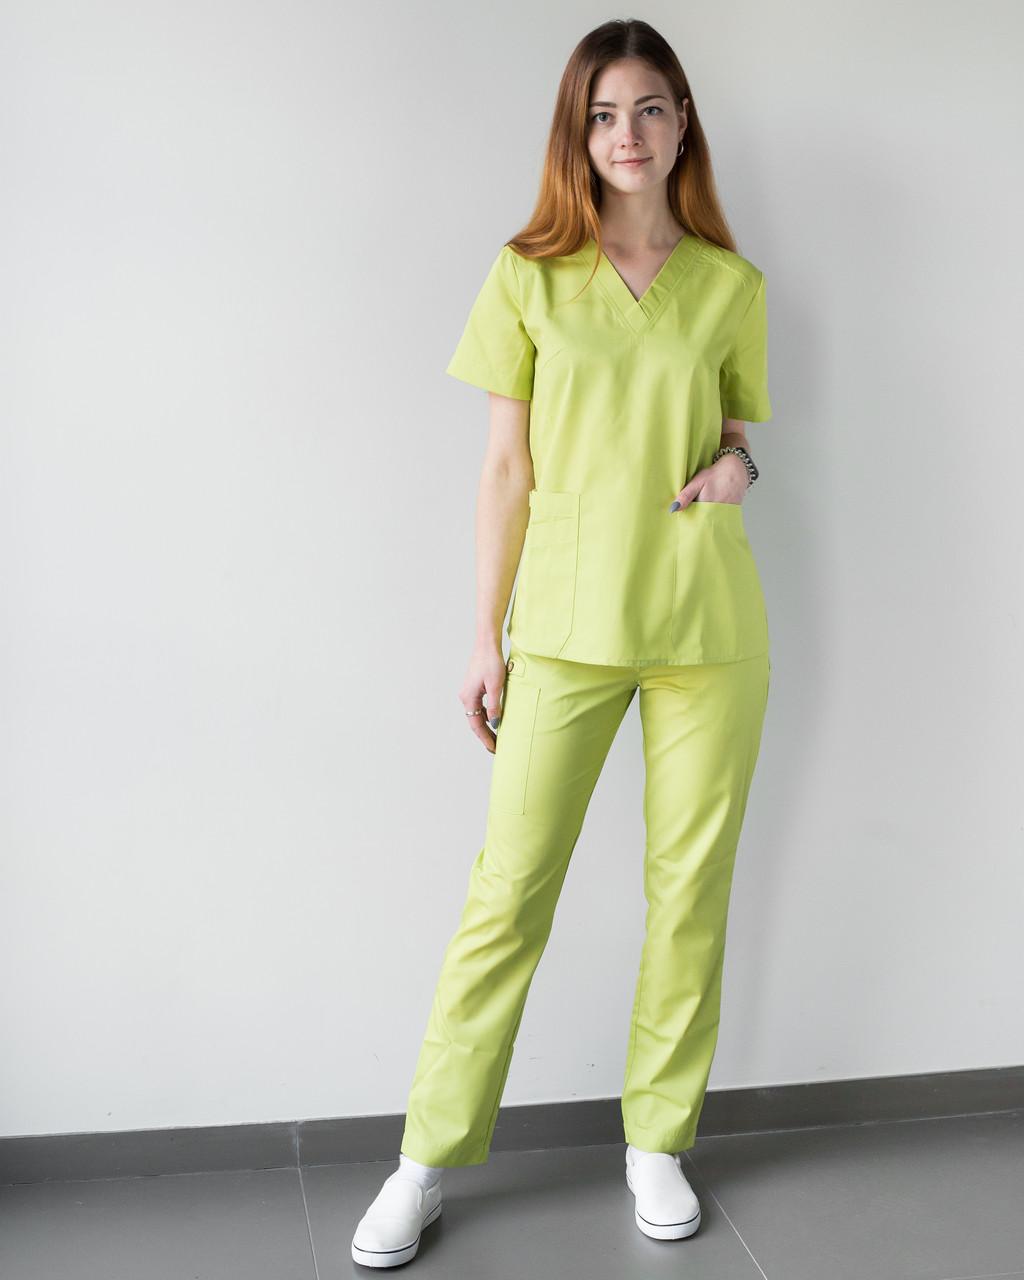 Медицинский женский костюм Toronto lime 40, 42, 44